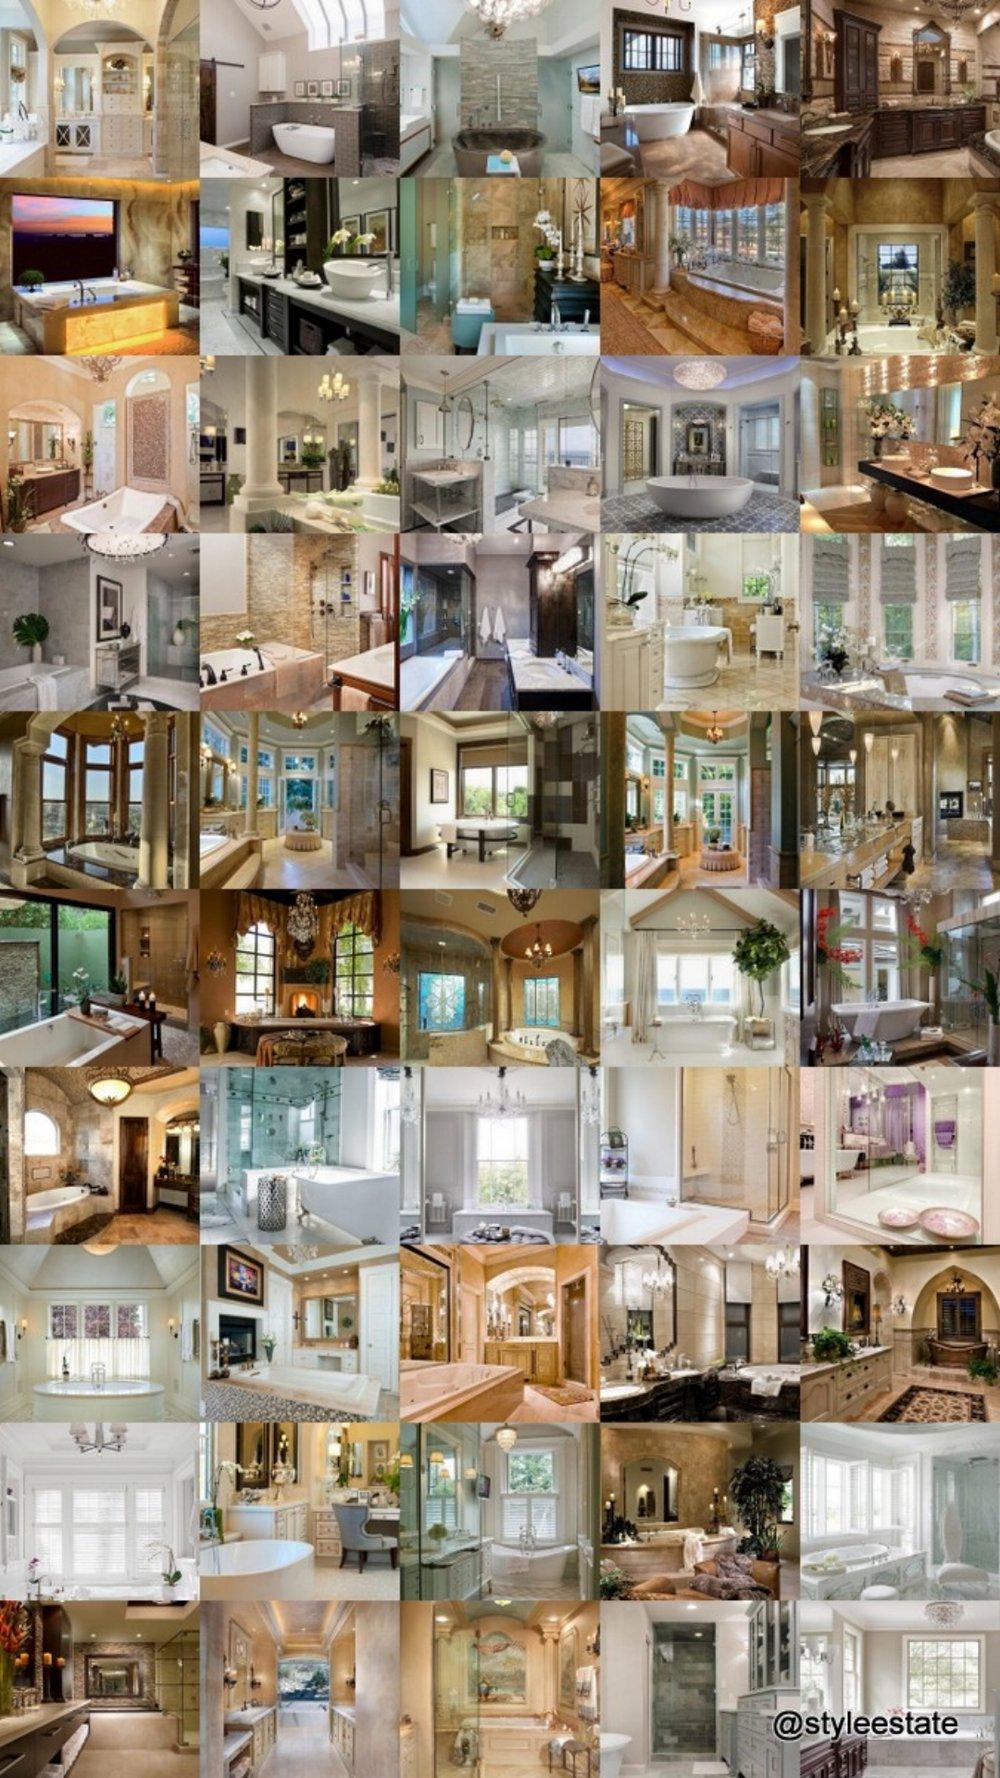 25 Amazing Bathroom Designs - Style Estate -